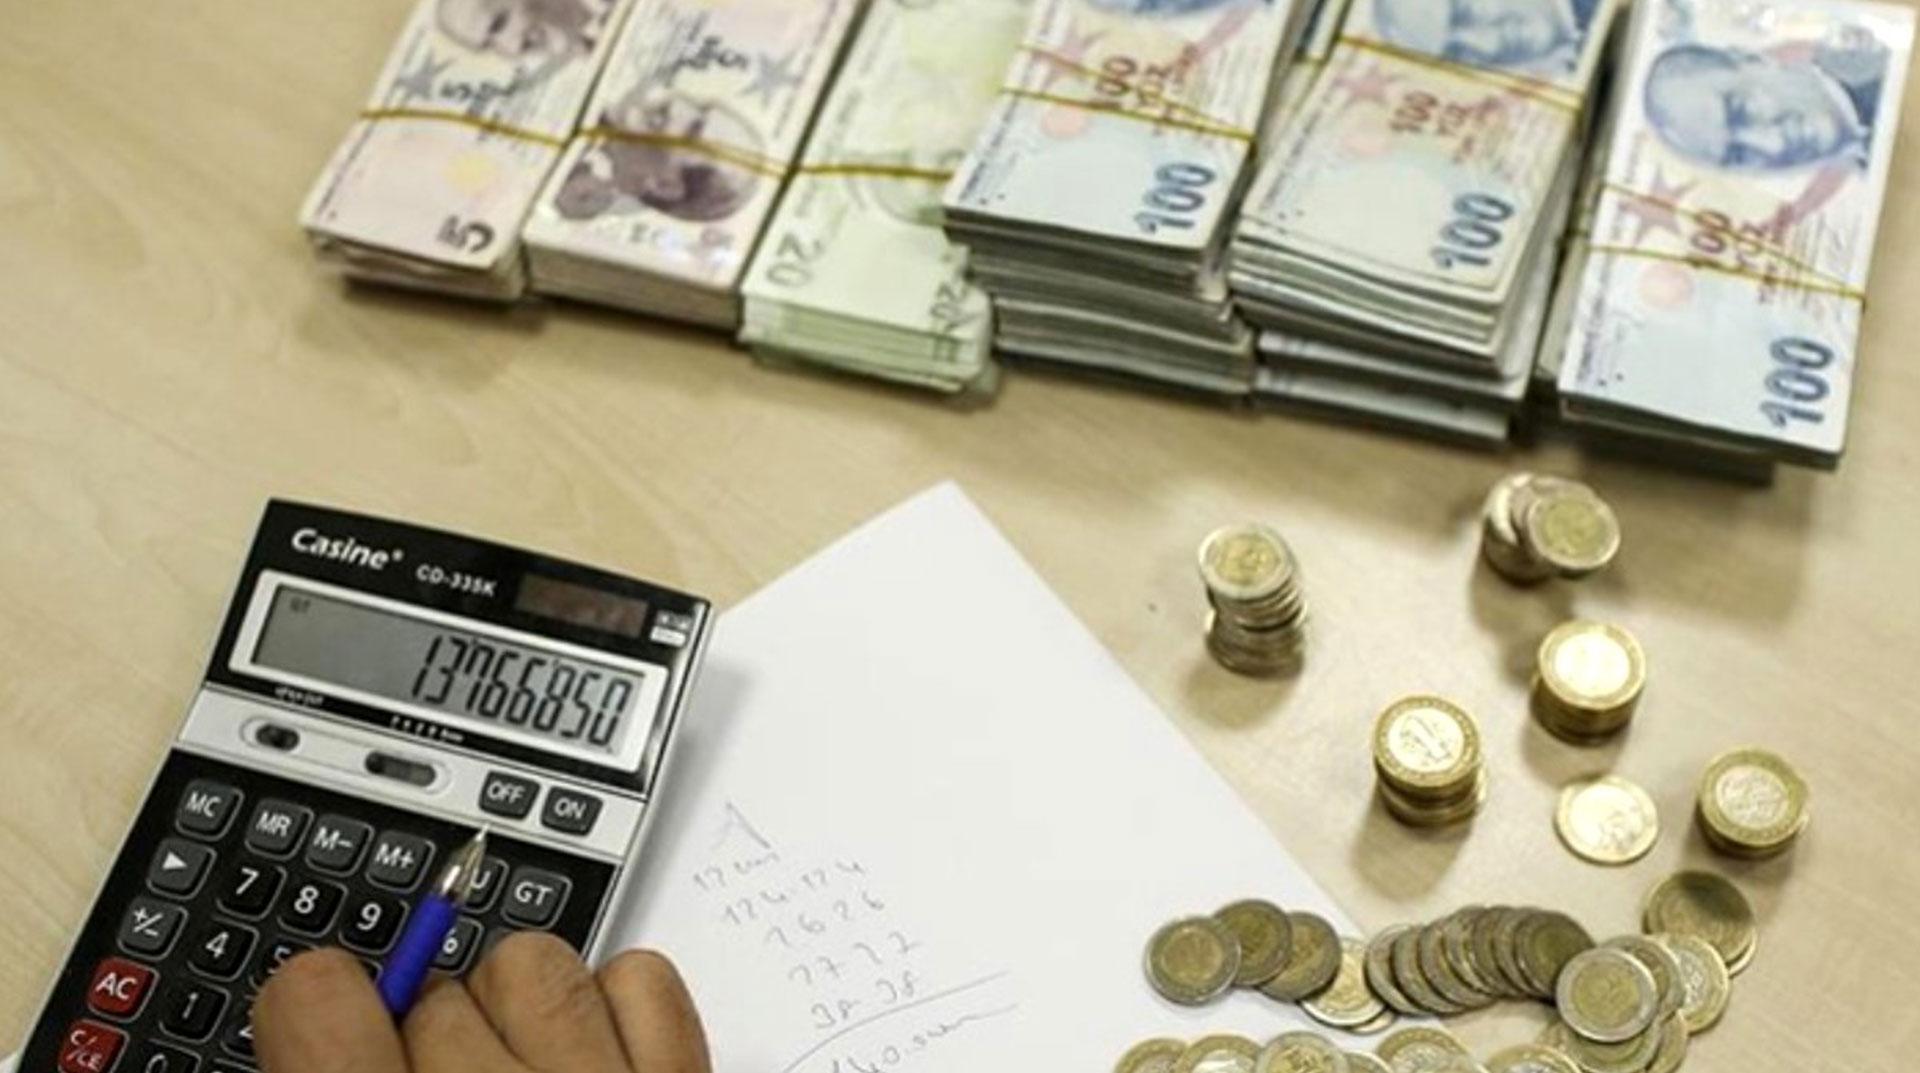 Hazine, toplam 2 milyar 345,7 milyon lira borçlandı